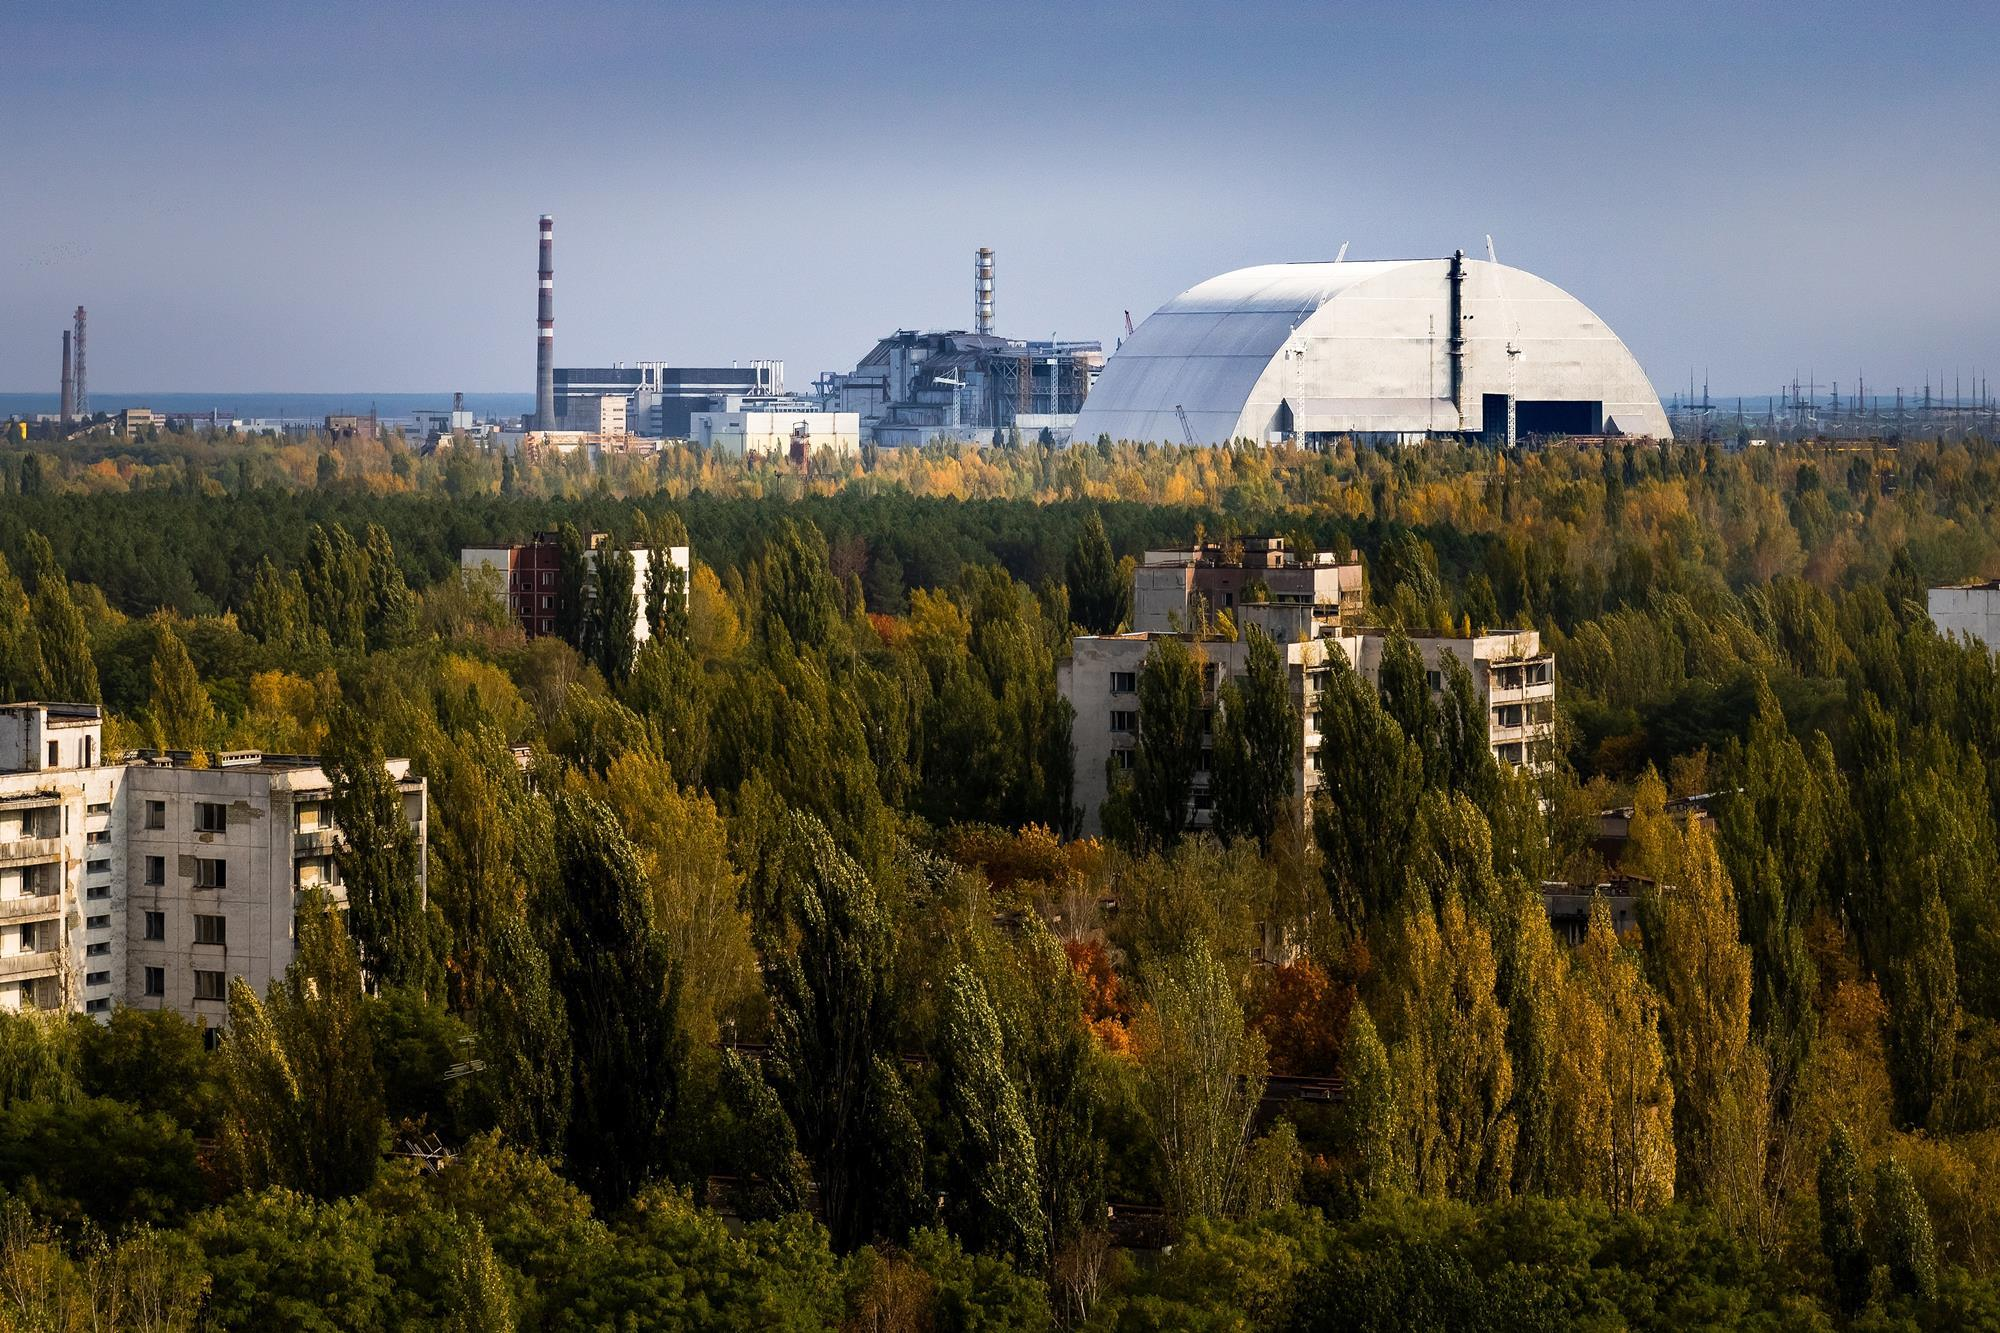 Chernobyl disaster mystery solved | Research | Chemistry World